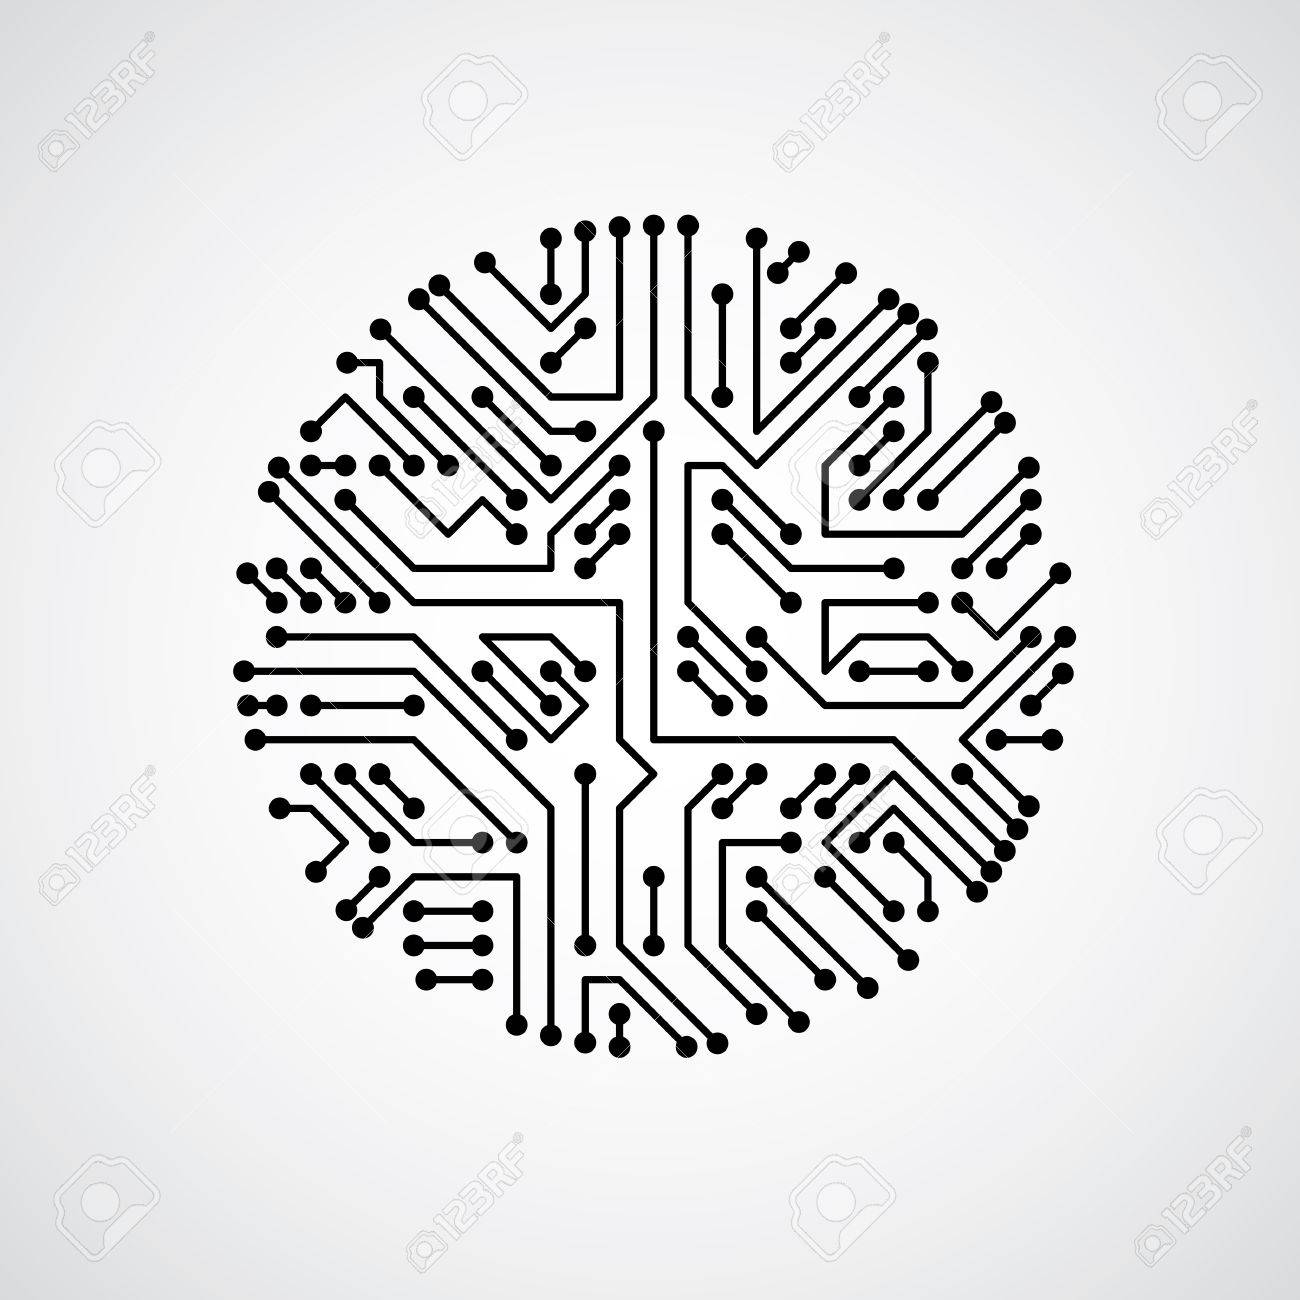 futuristic cybernetic scheme vector motherboard black and white